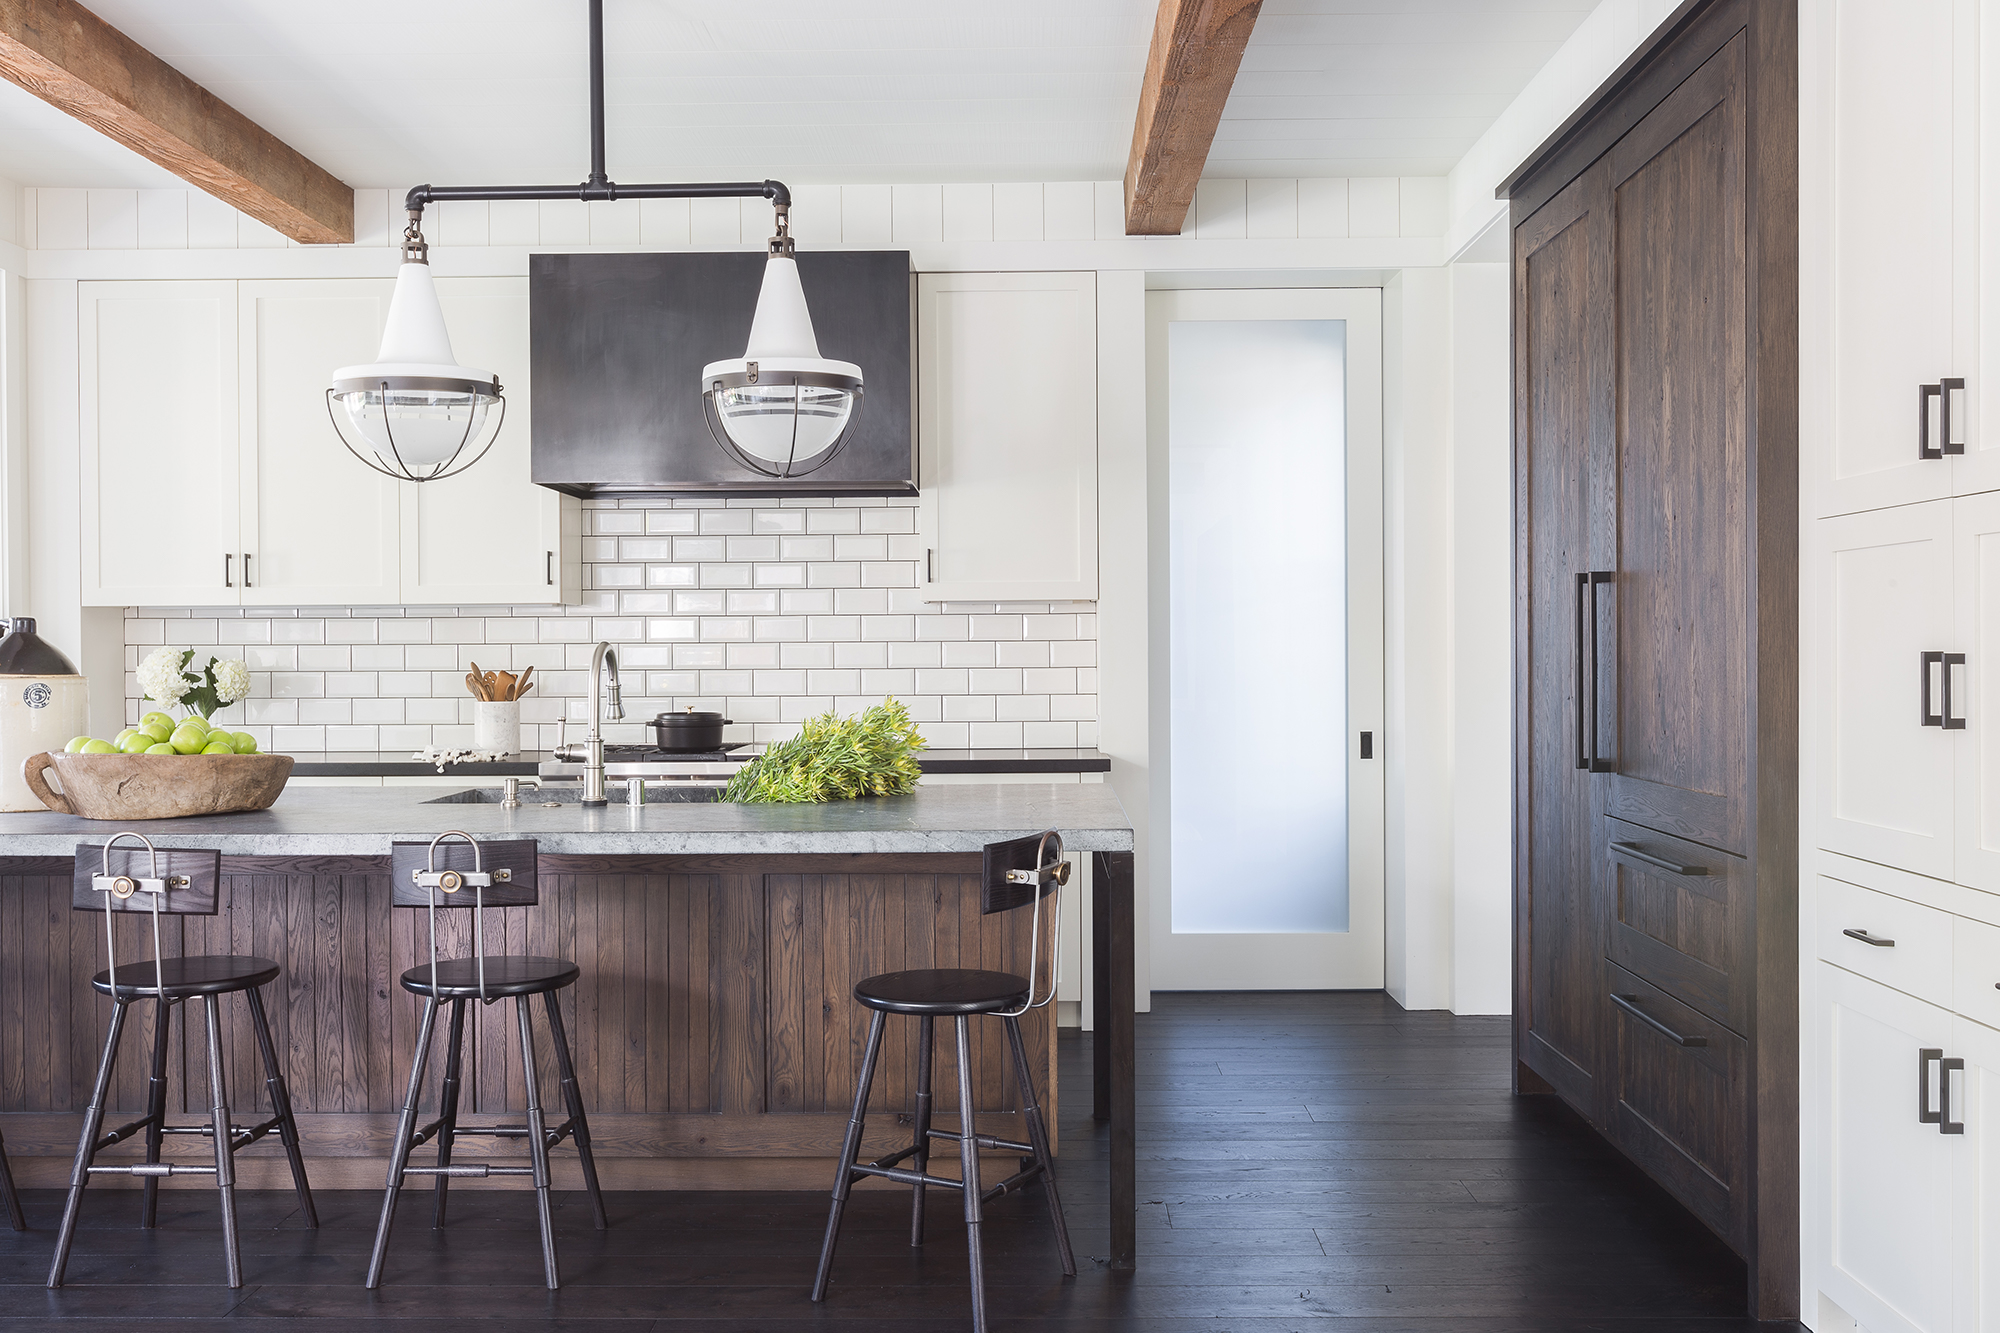 Jennifer_robins_interiors_projects_south_bay_AlyssaRosenheck2016-8_kitchen_fridge_island